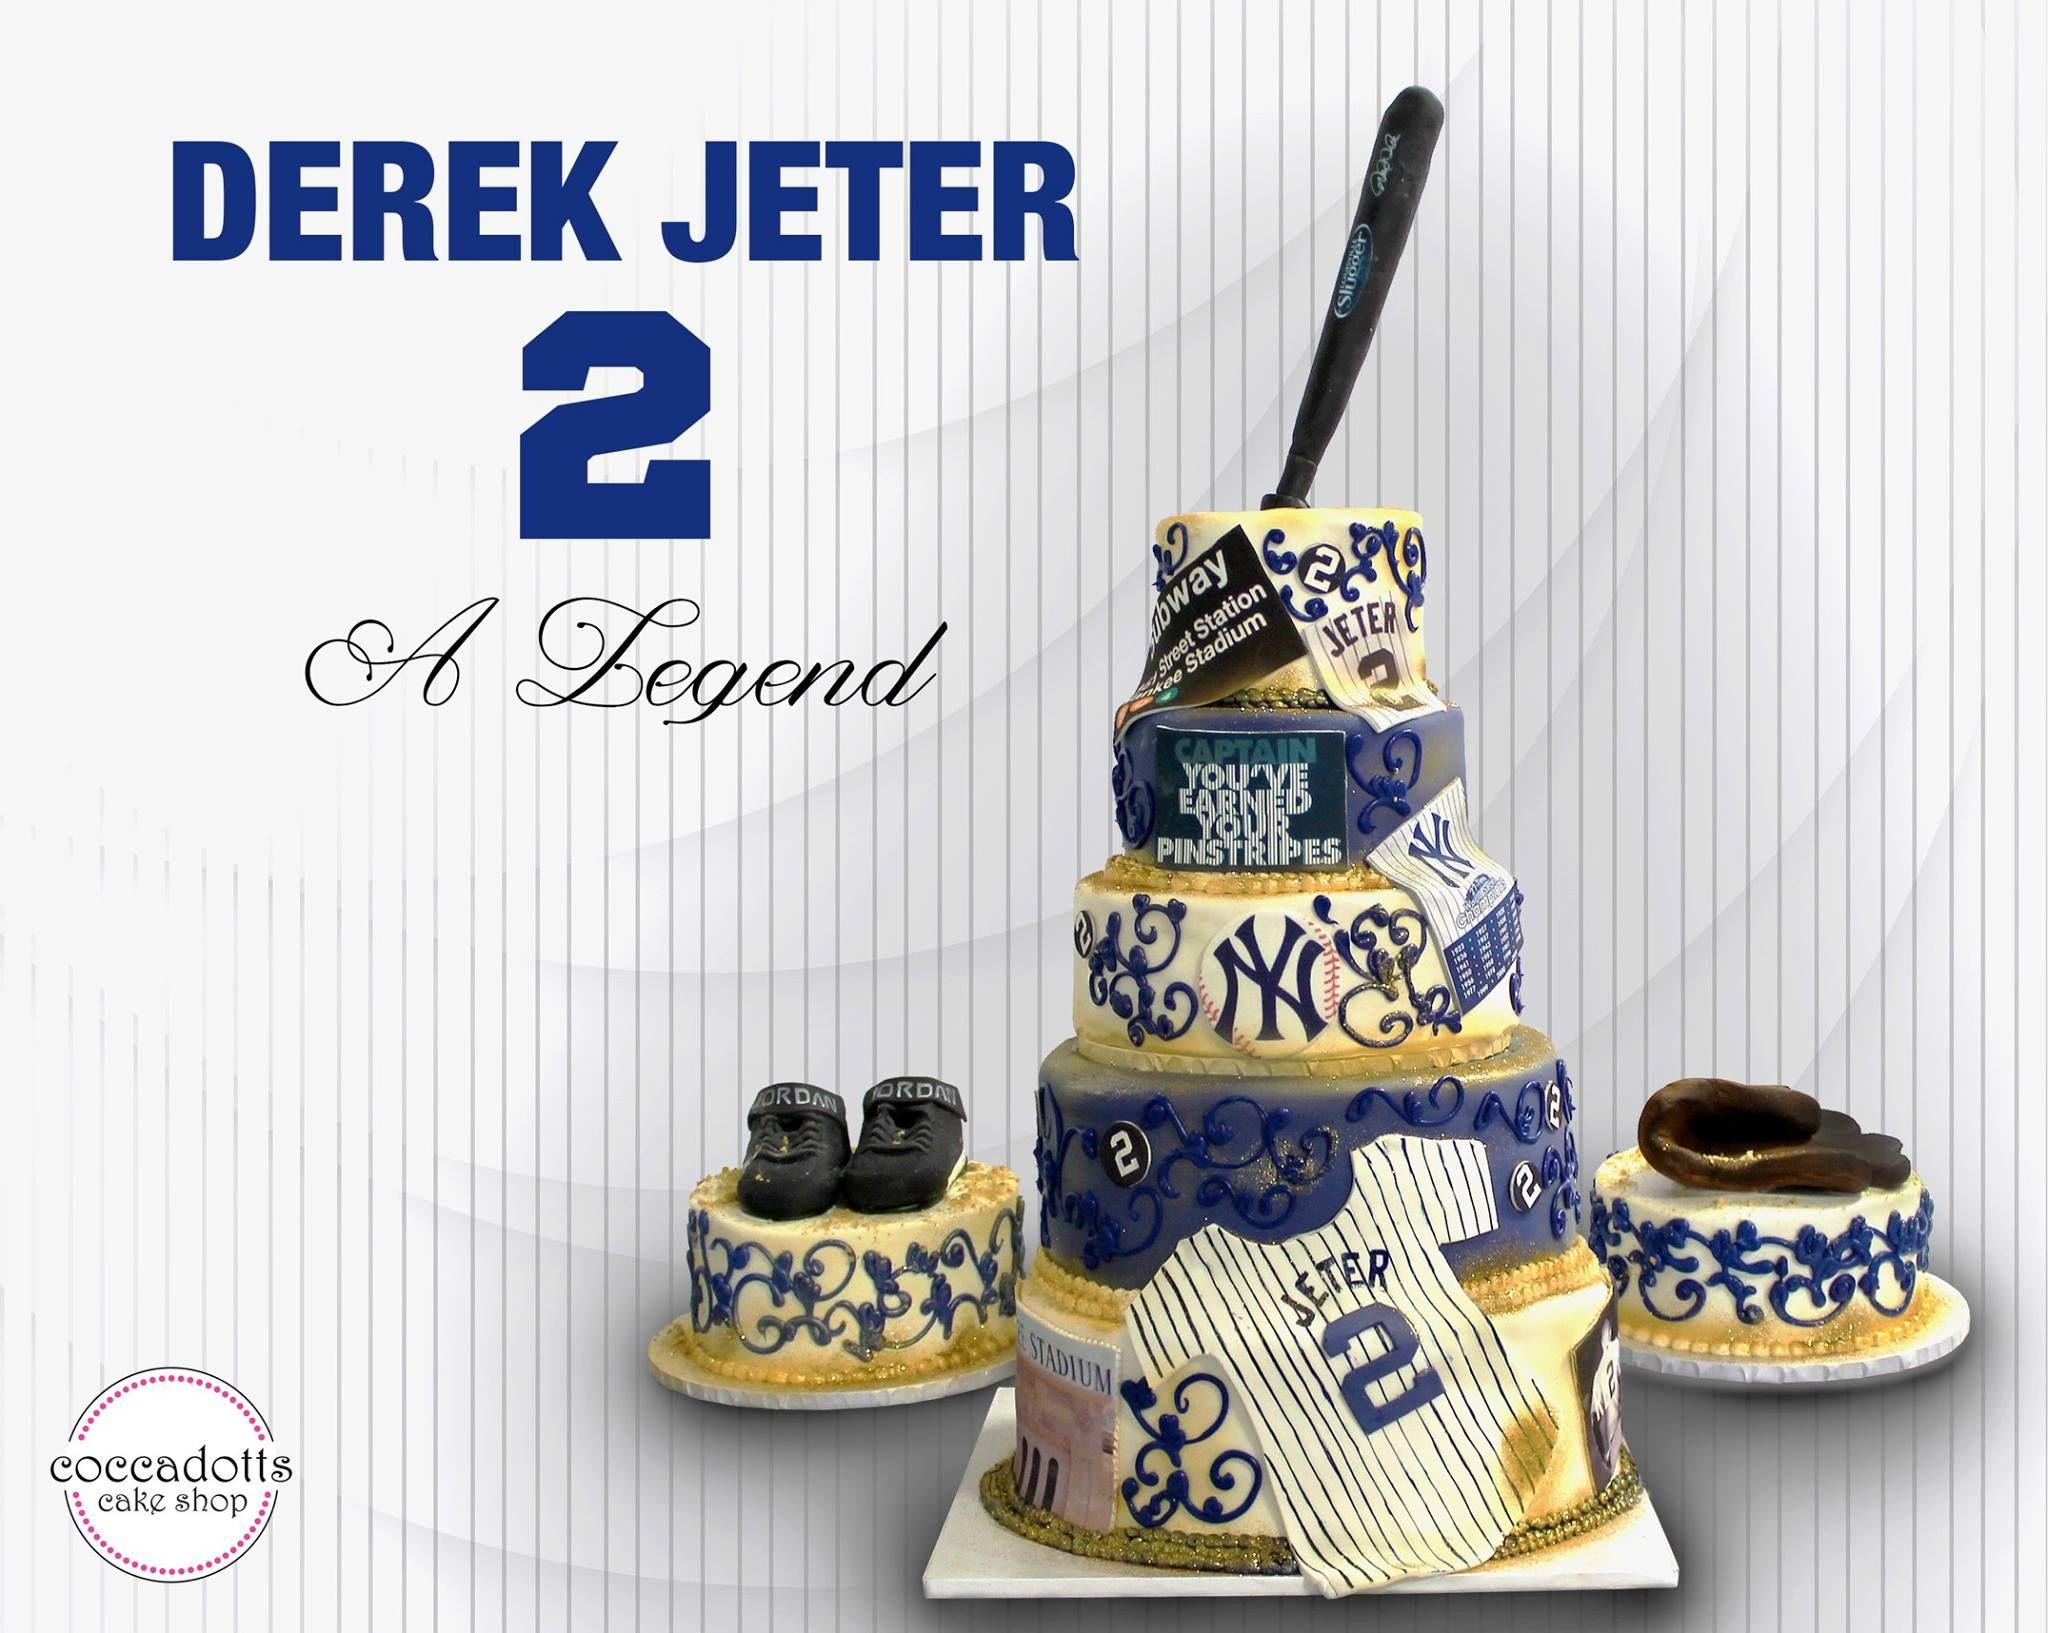 Terrific Derek Jeter Retirement Cake By Coccadotts Bakery Albany Ny Funny Birthday Cards Online Ioscodamsfinfo